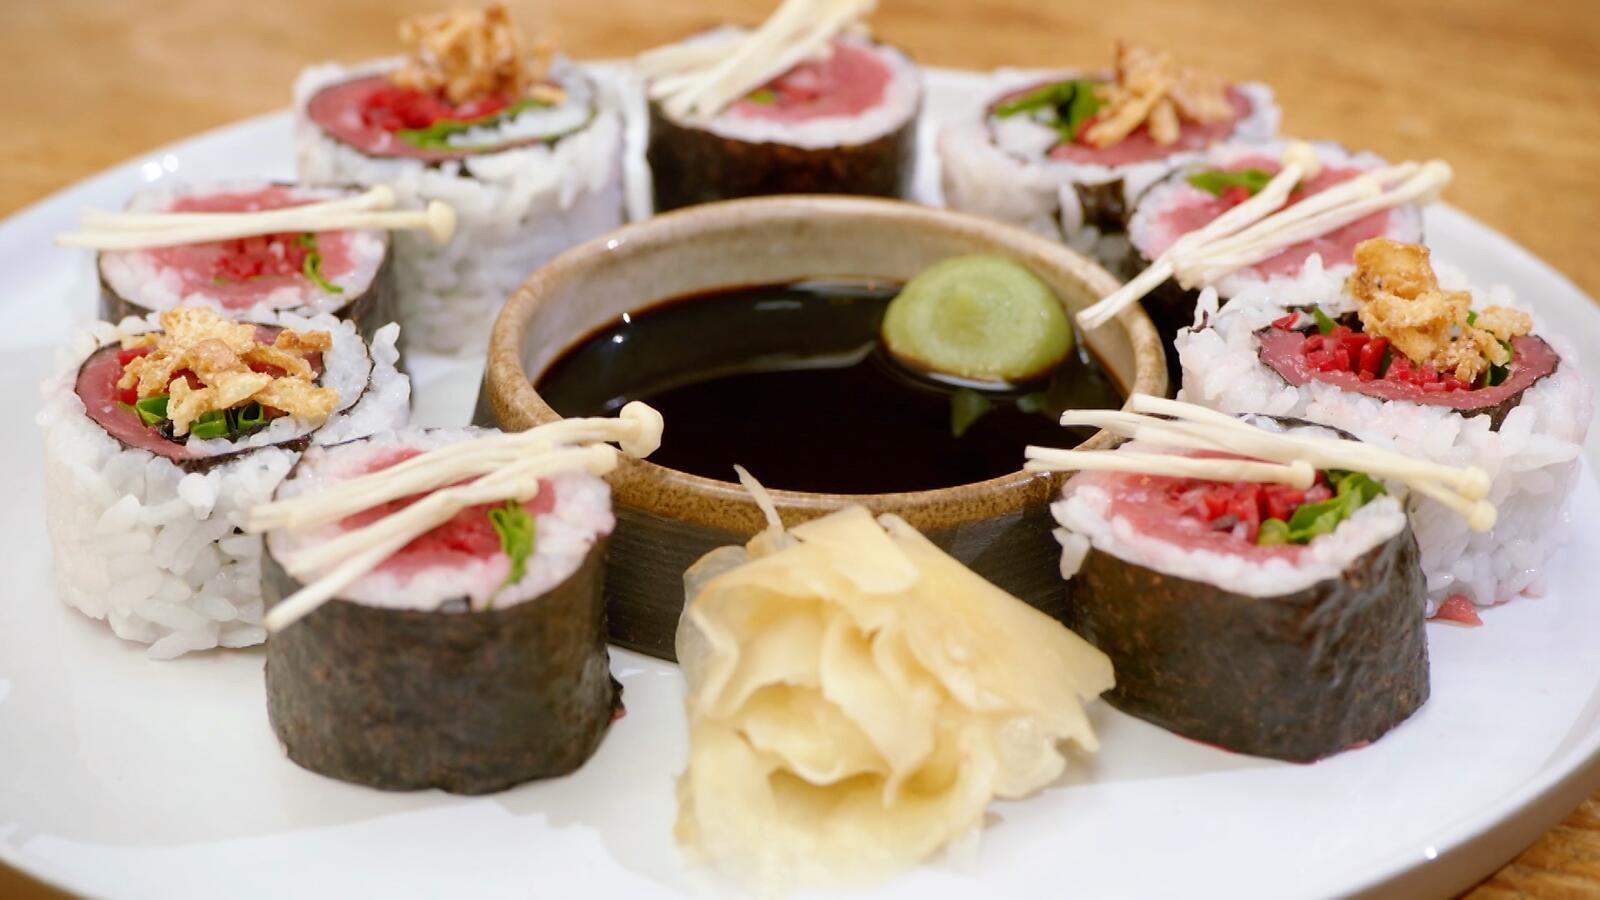 California roll en sushi met rundvlees, rode biet en waterkers